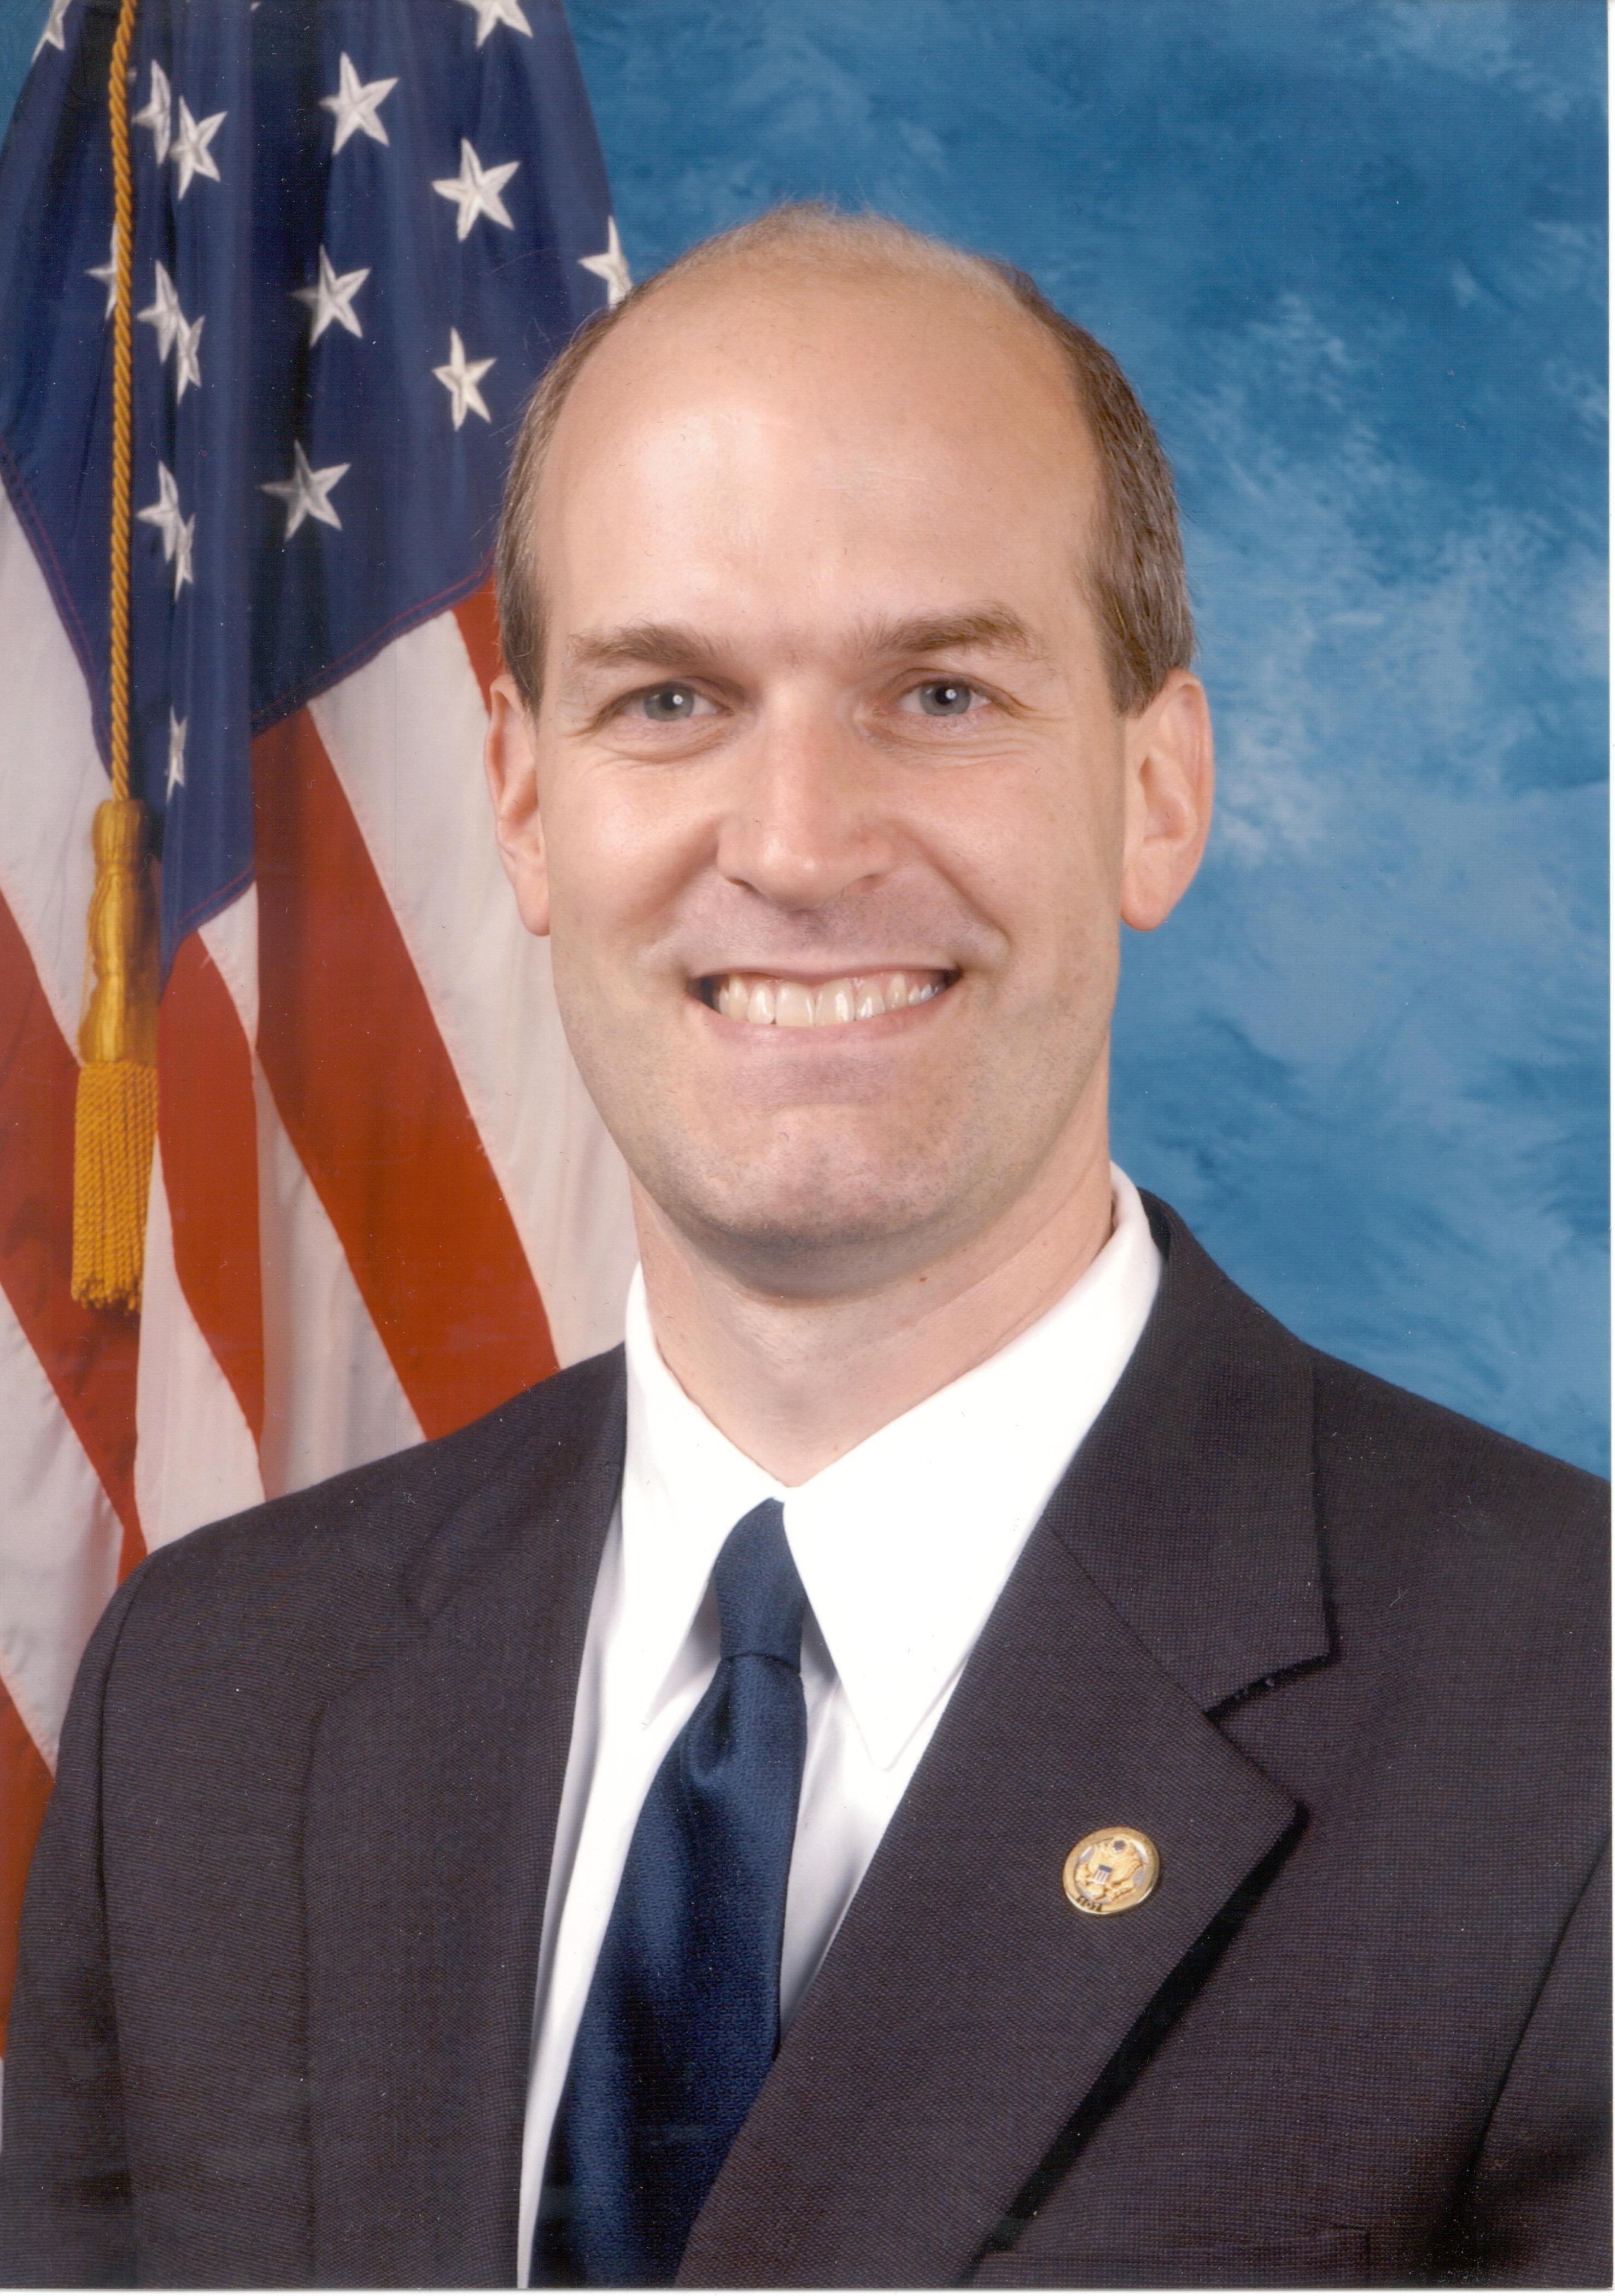 Congressman Larsen